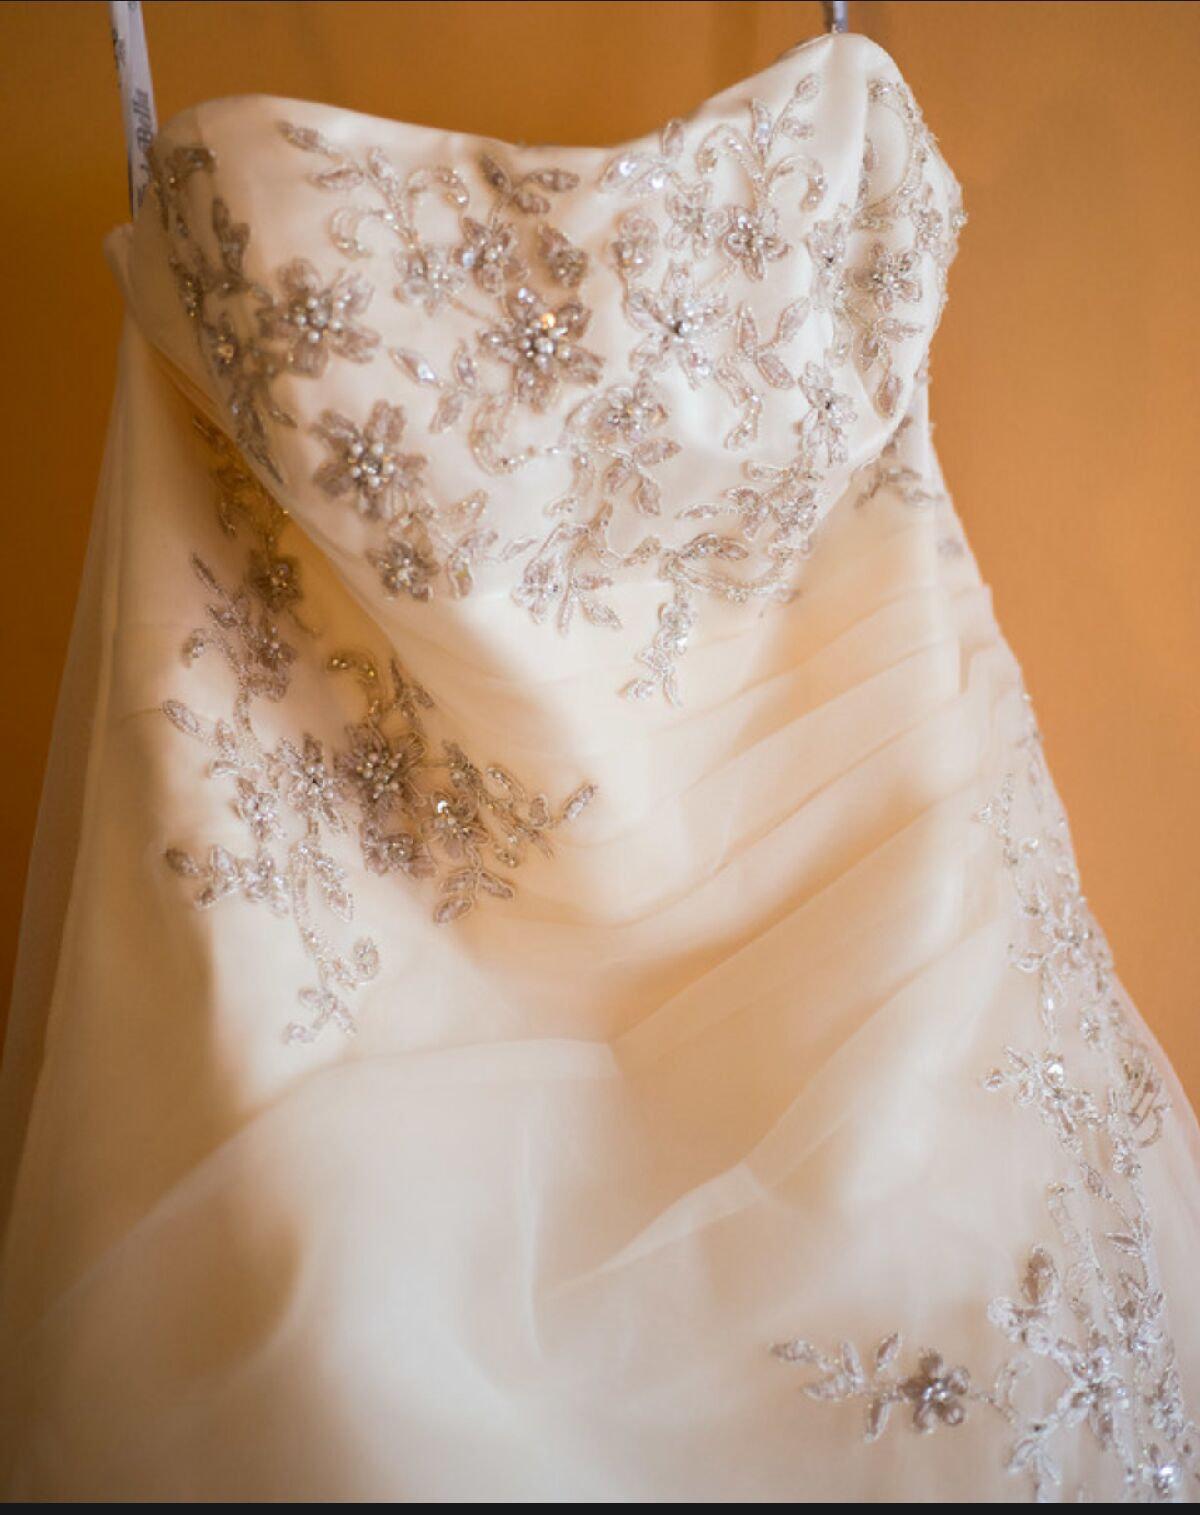 Dress Consultation / Fitting